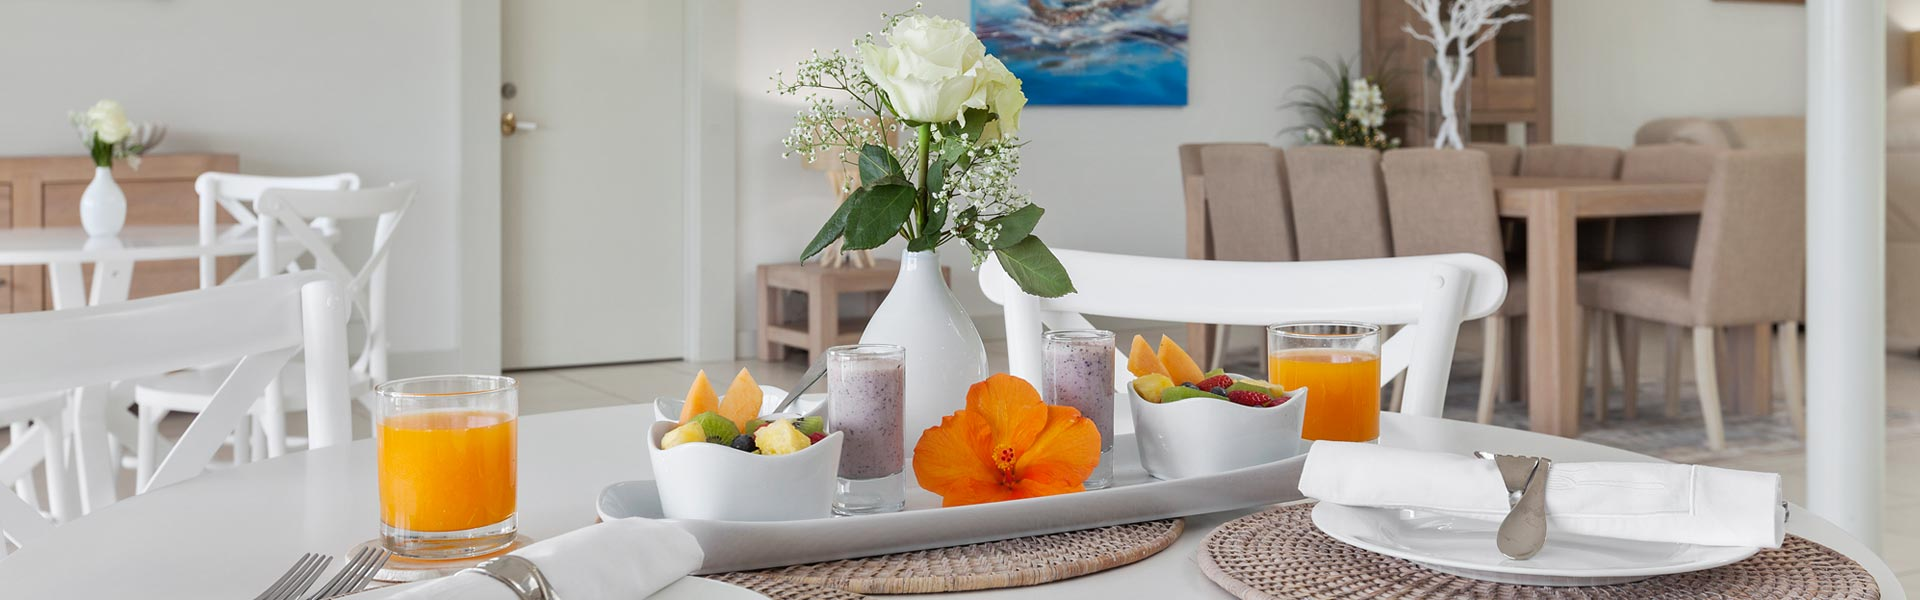 Luxury Accommodation Montville Guest Breakfast